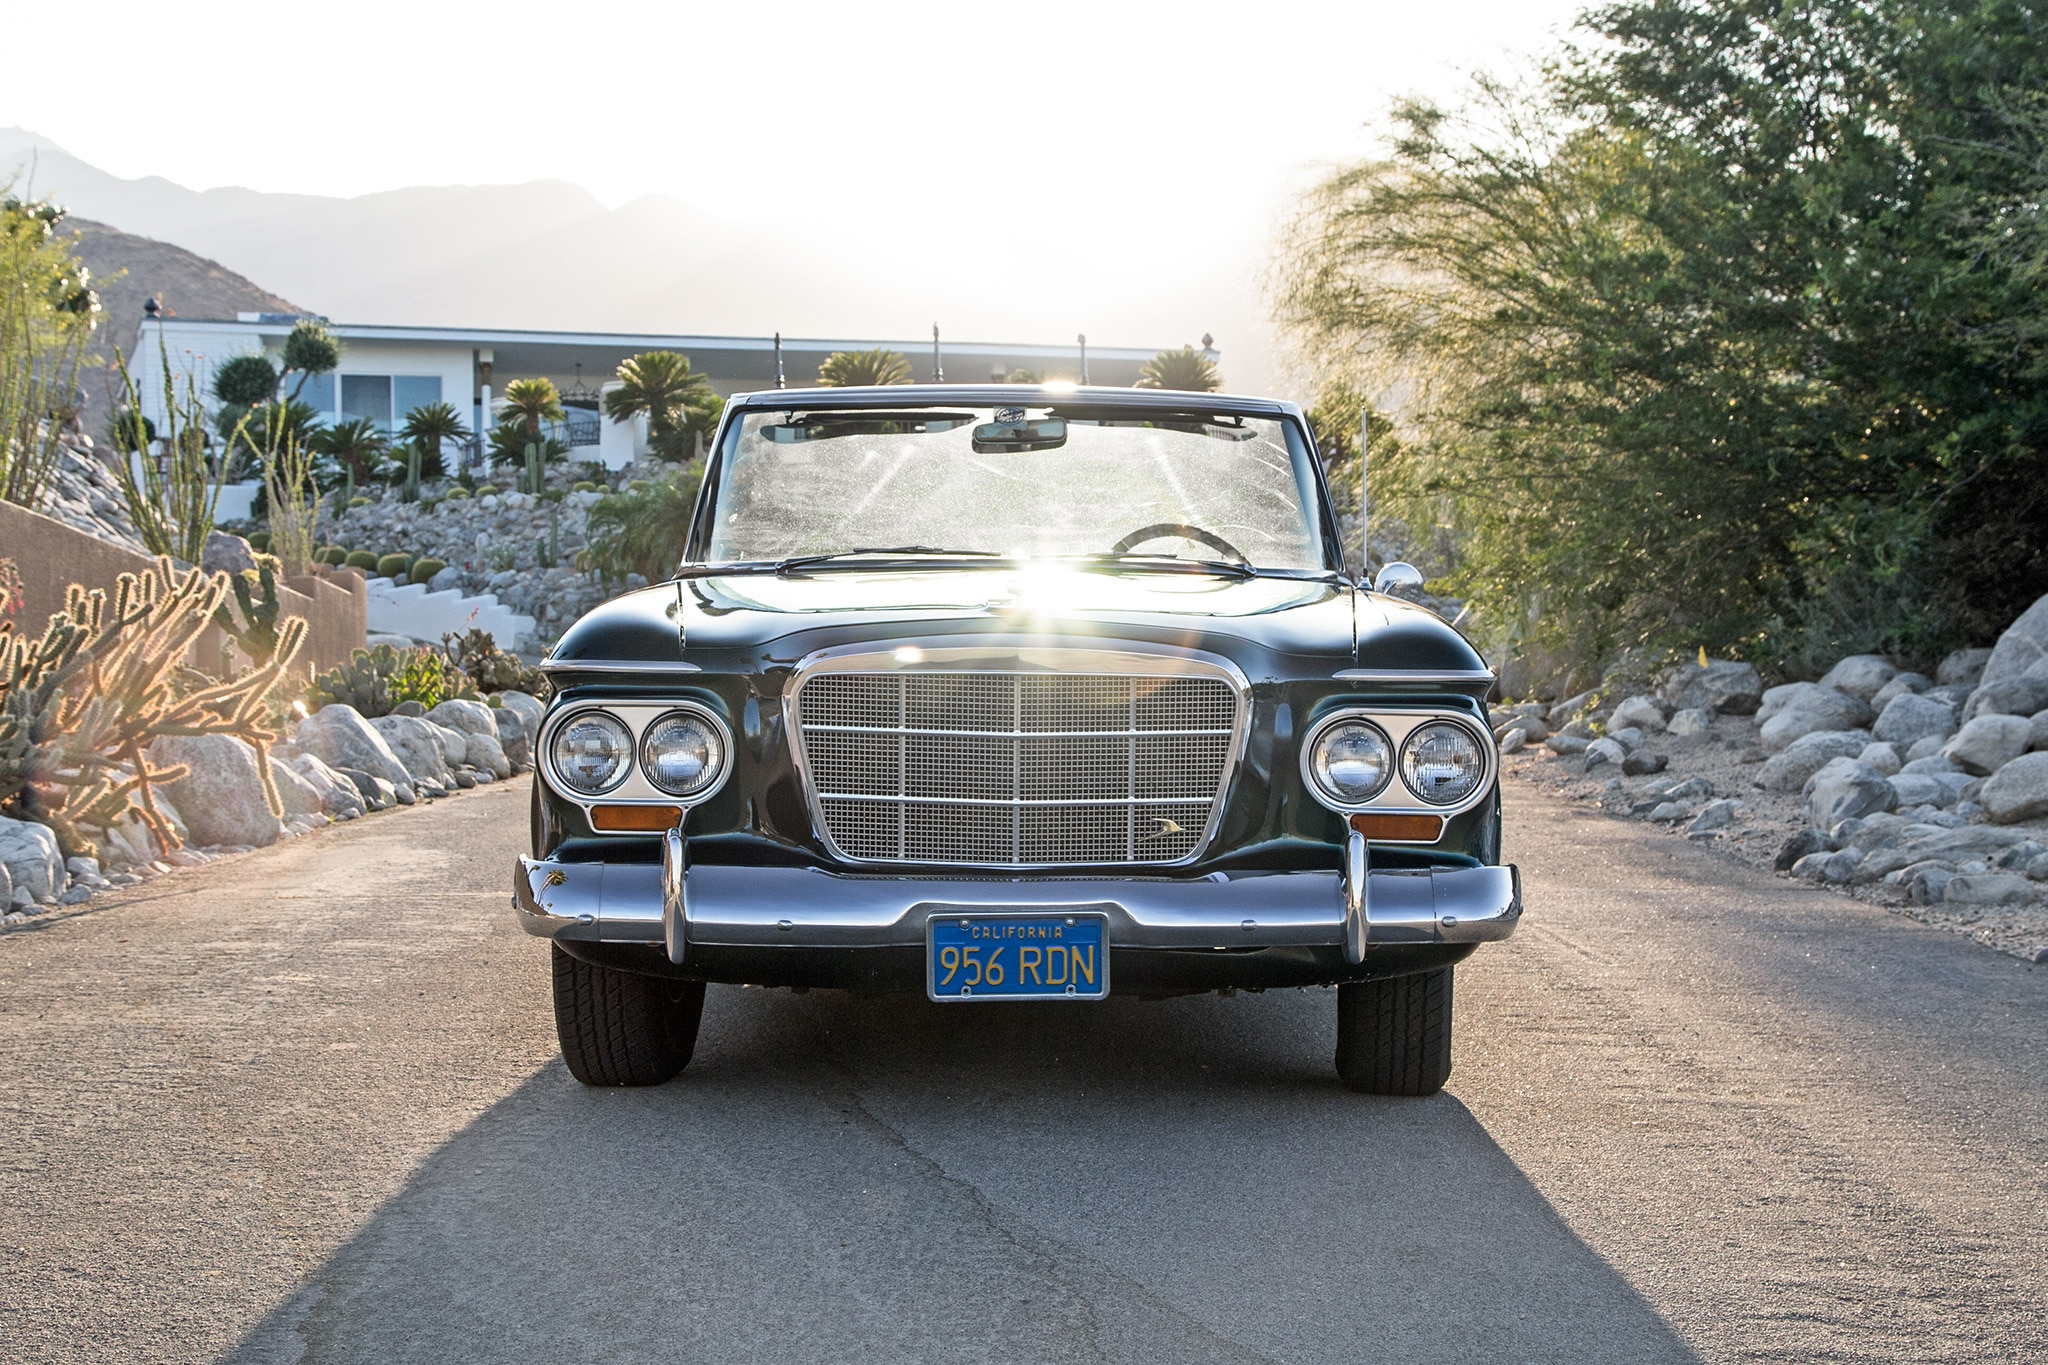 1962-1963 Studebaker Lark Daytona Collectible Classic Car ...